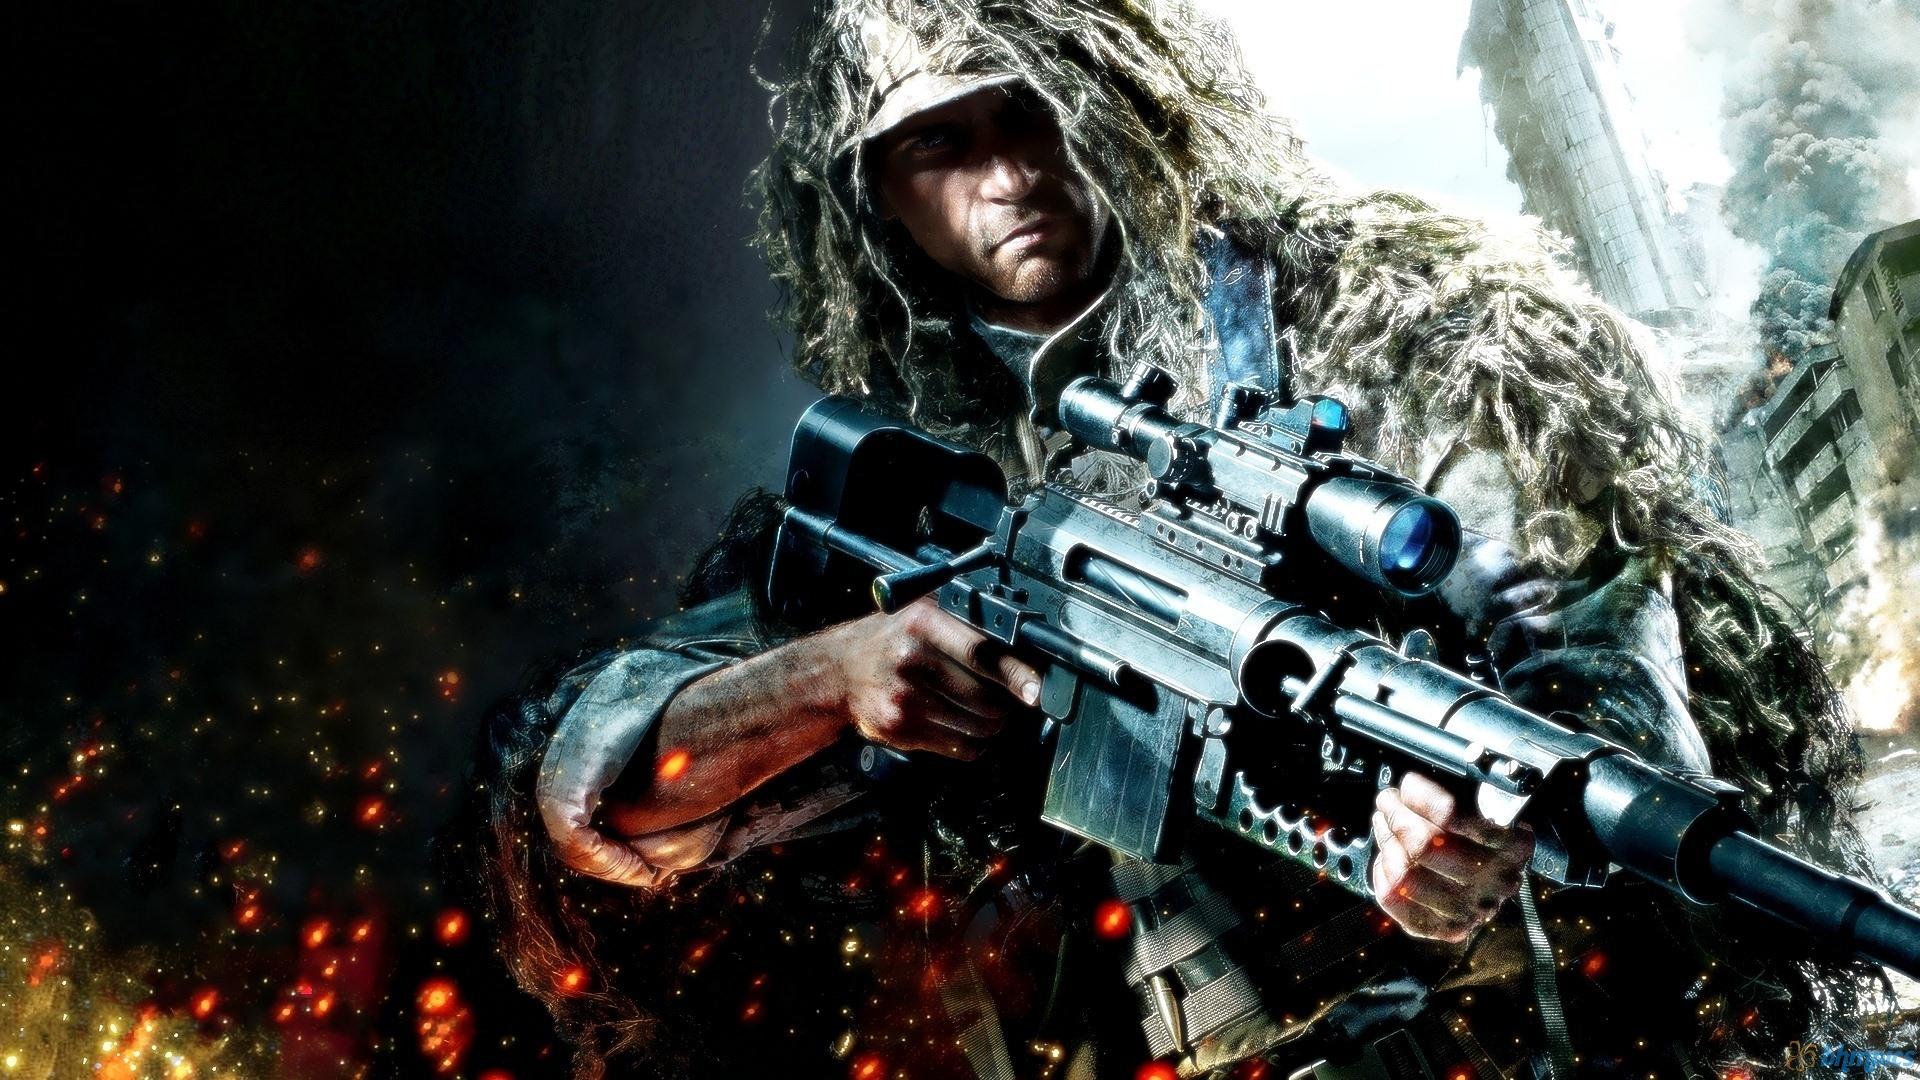 Sniper Ghost Warrior 2 Hd Wallpaper 14 1920x1080